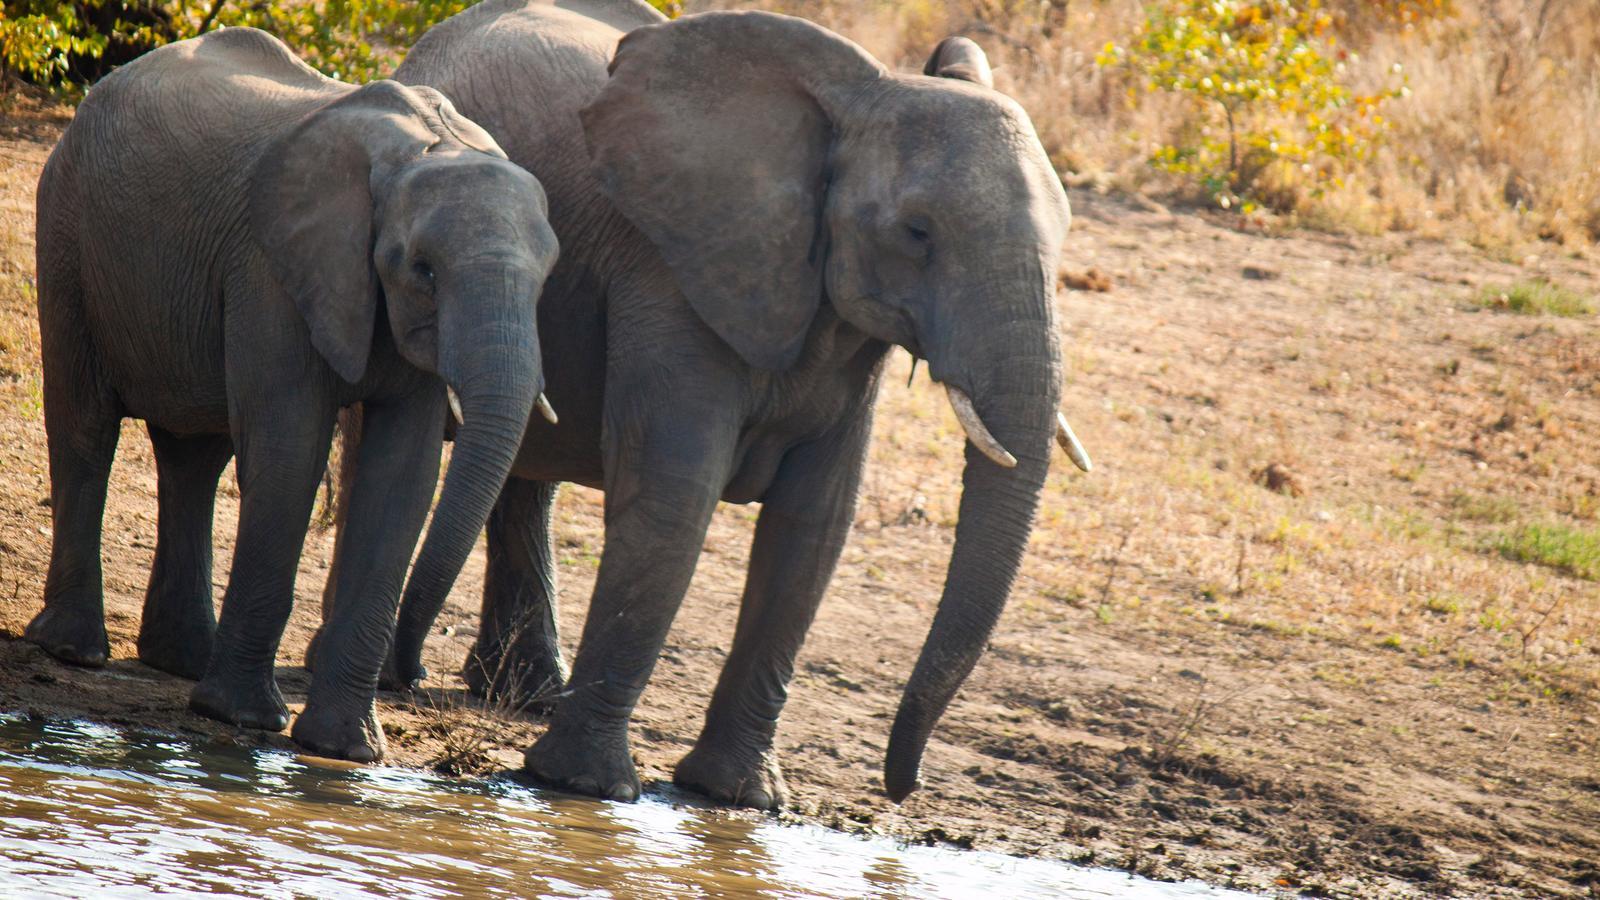 traveljunkies Elefanten im Krüger Nationalpark Namibia Südafrika Safari Kapstadt Johannesburg Abenteuerreise National Geographic Gruppenreise Erlebnisreise Etosha Nationalpark